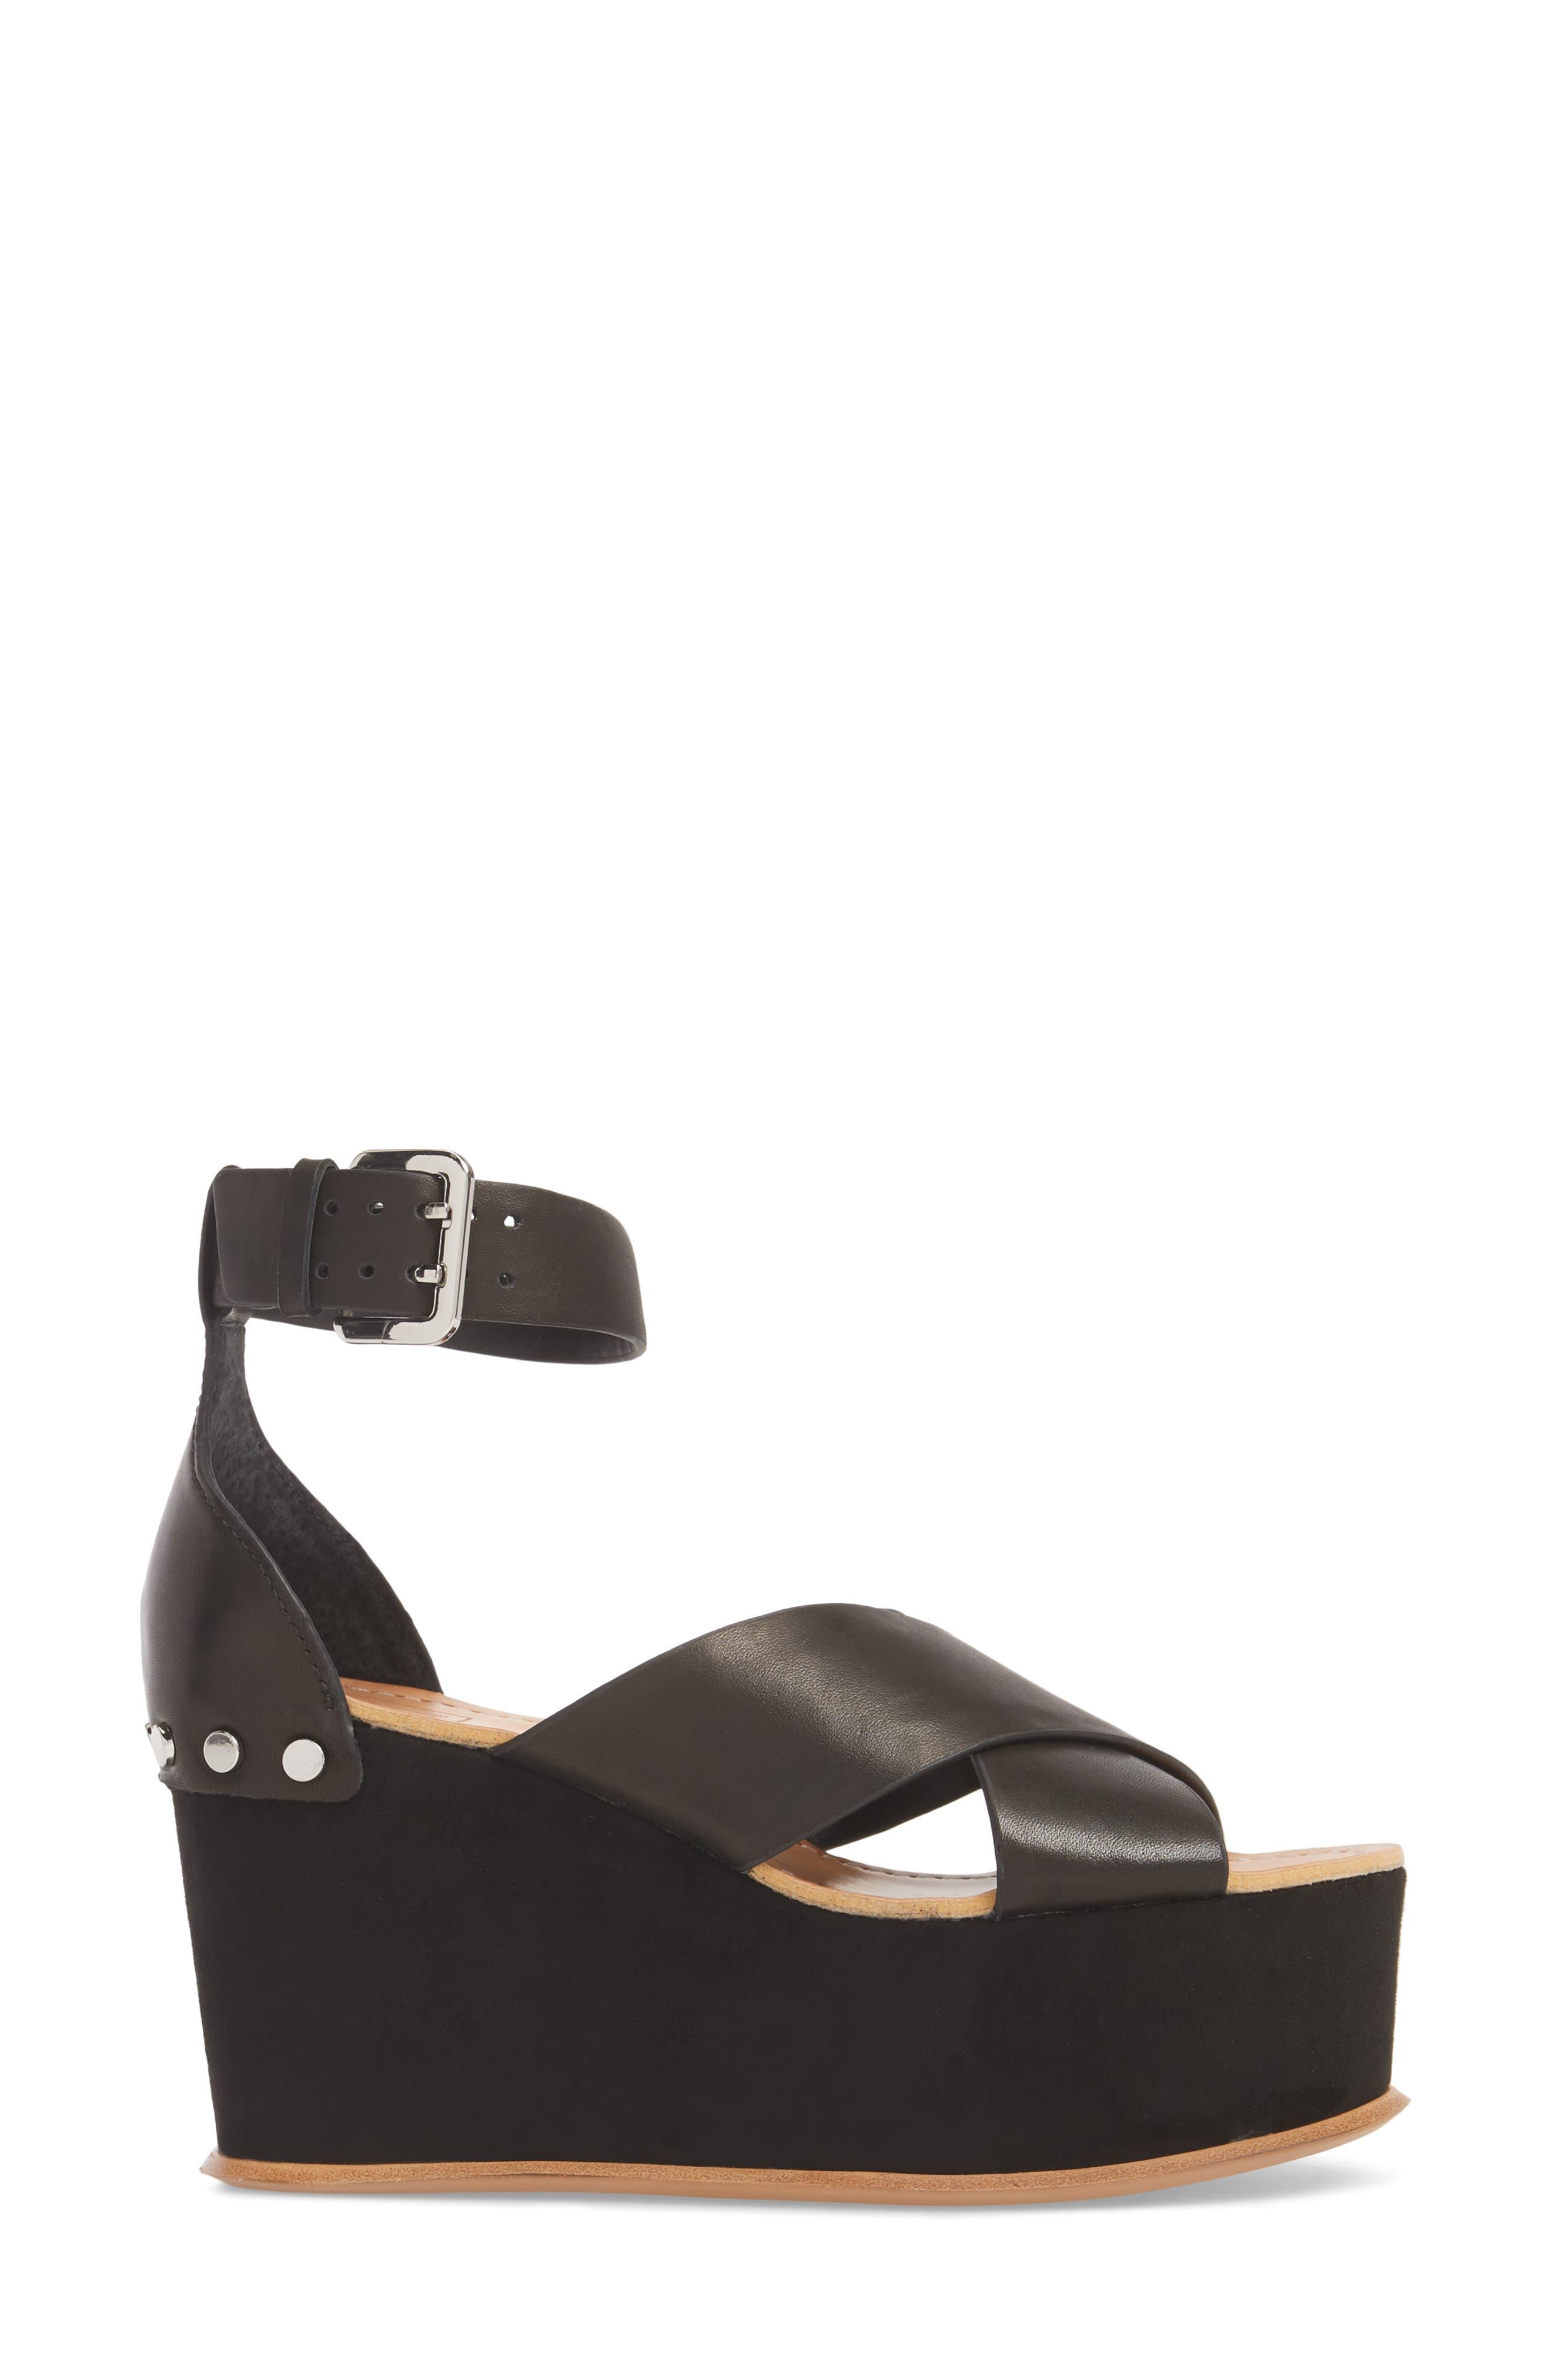 DOLCE VITA,                             Dalrae Platform Wedge Sandal,                             Alternate thumbnail 3, color,                             001